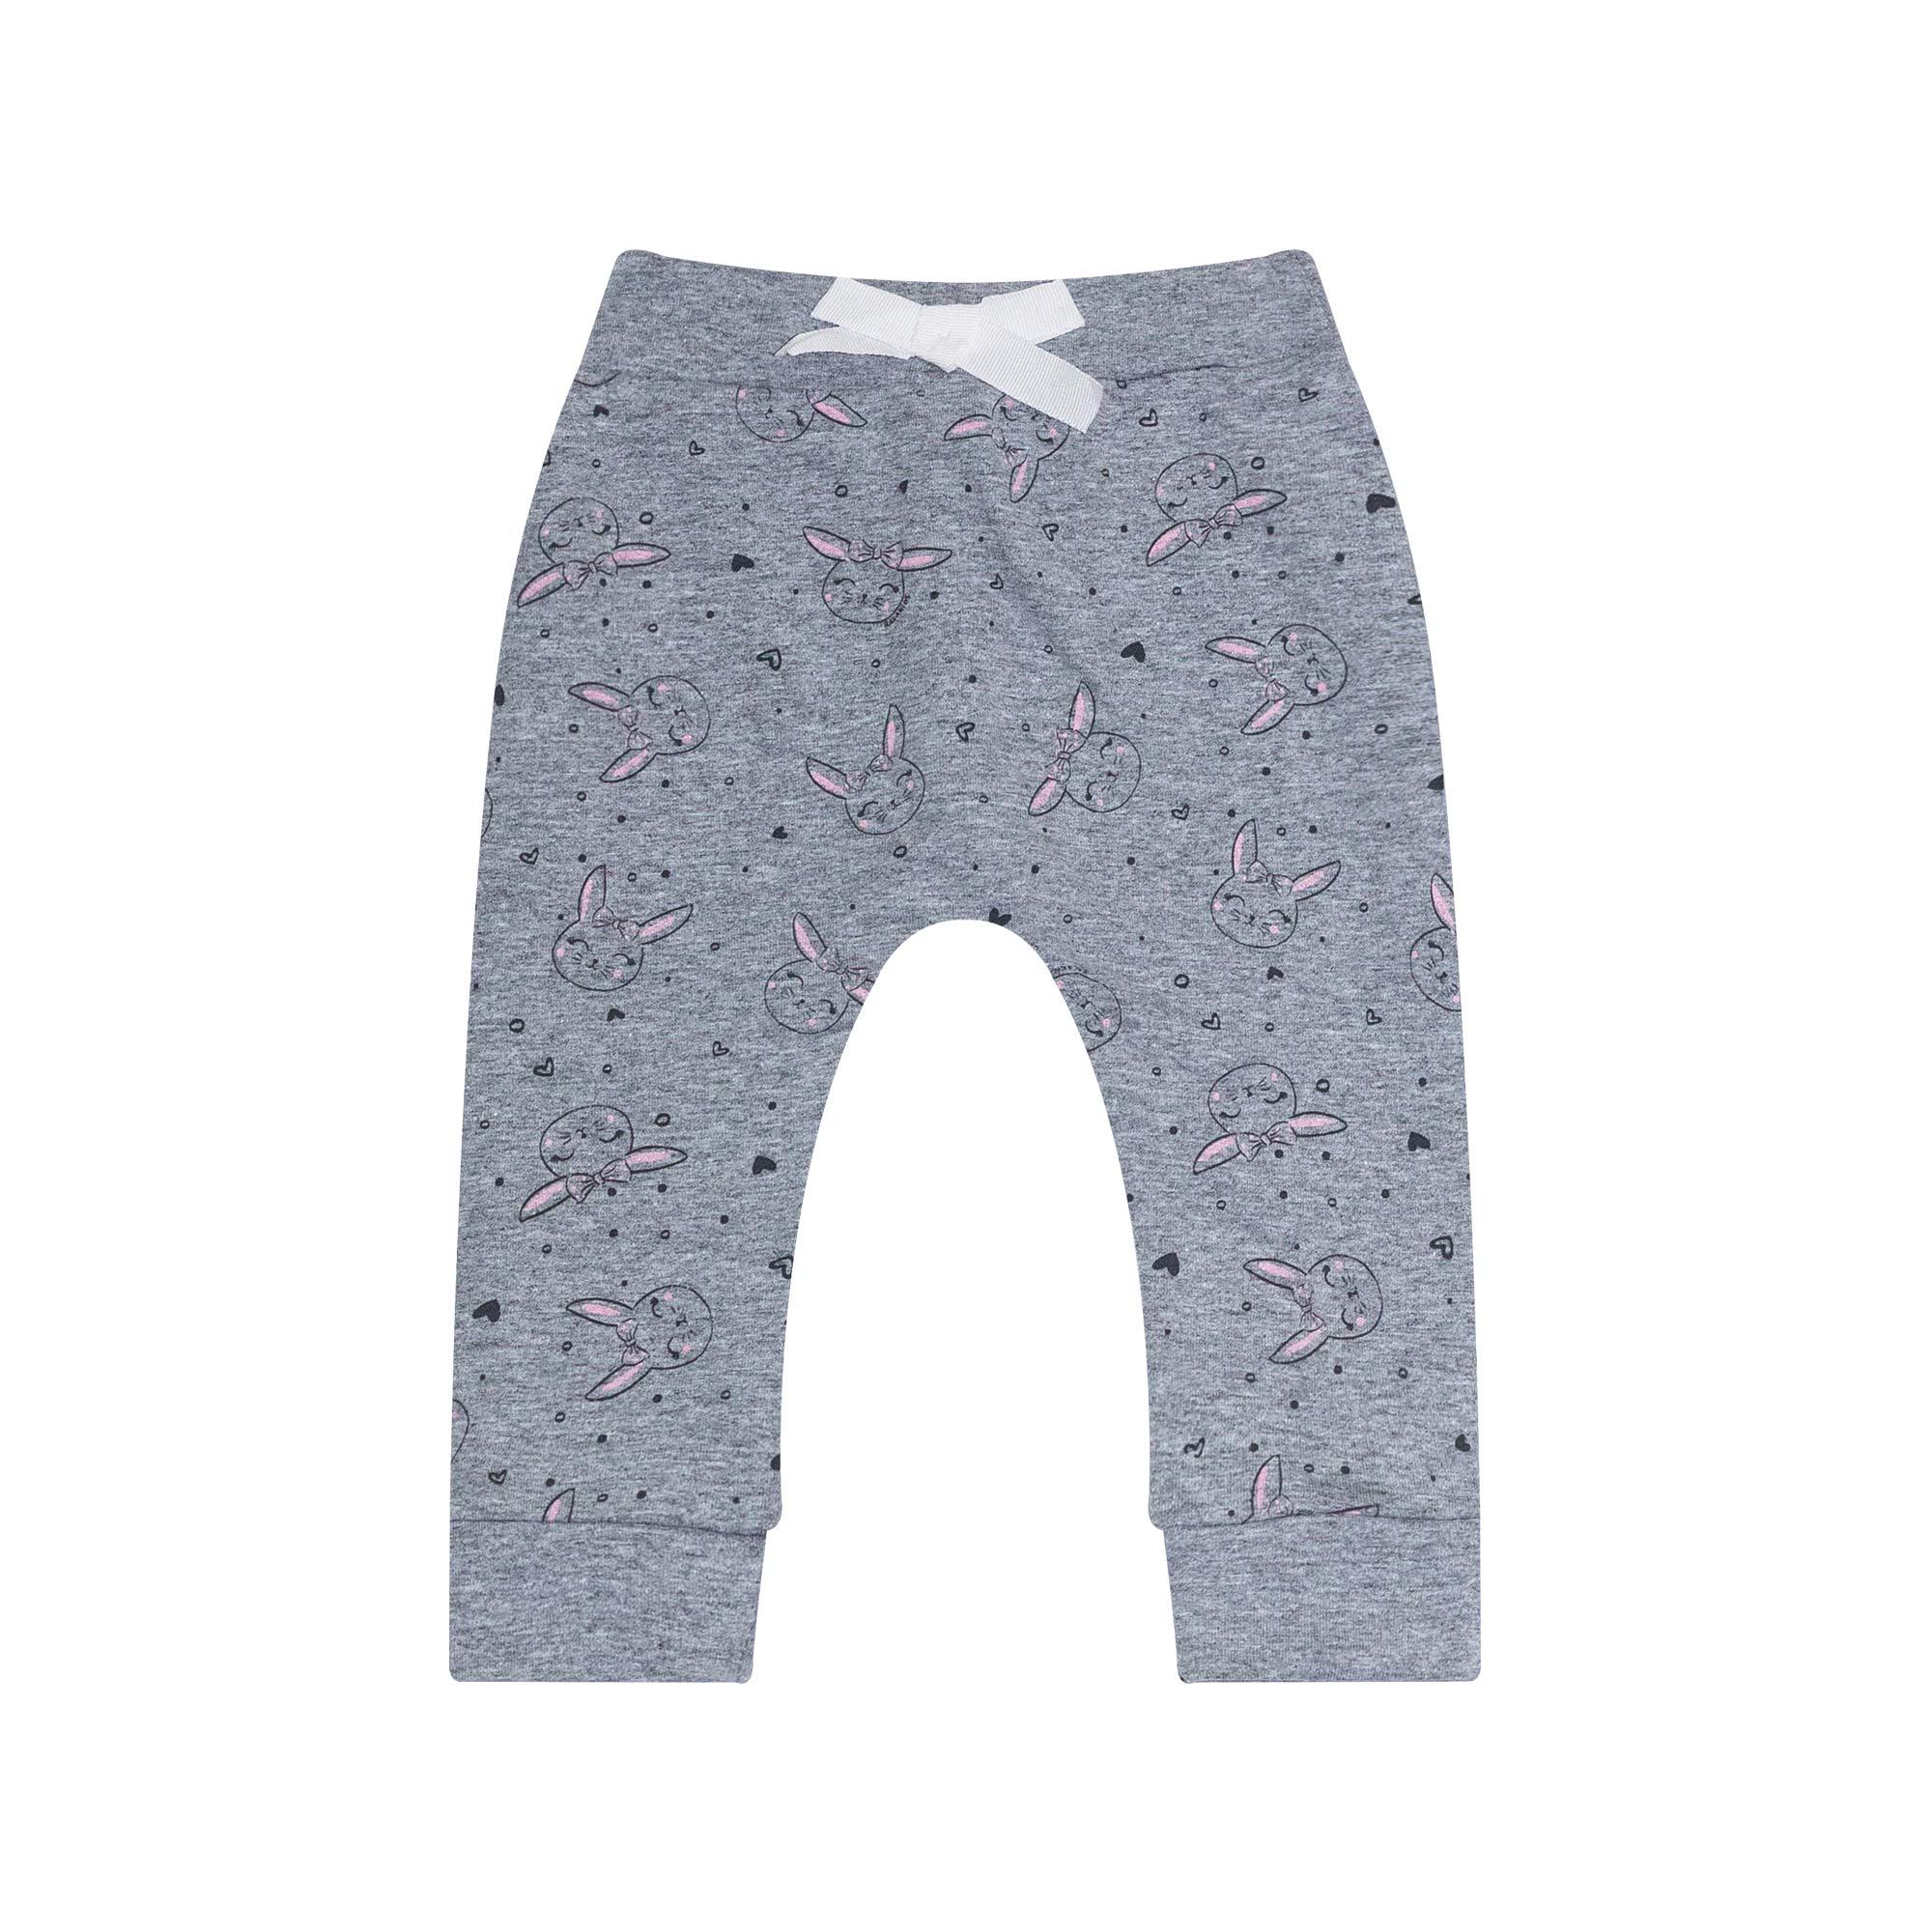 Calça Jogger Infantil Feminino - Ref 7115 - Mescla - Ralakids